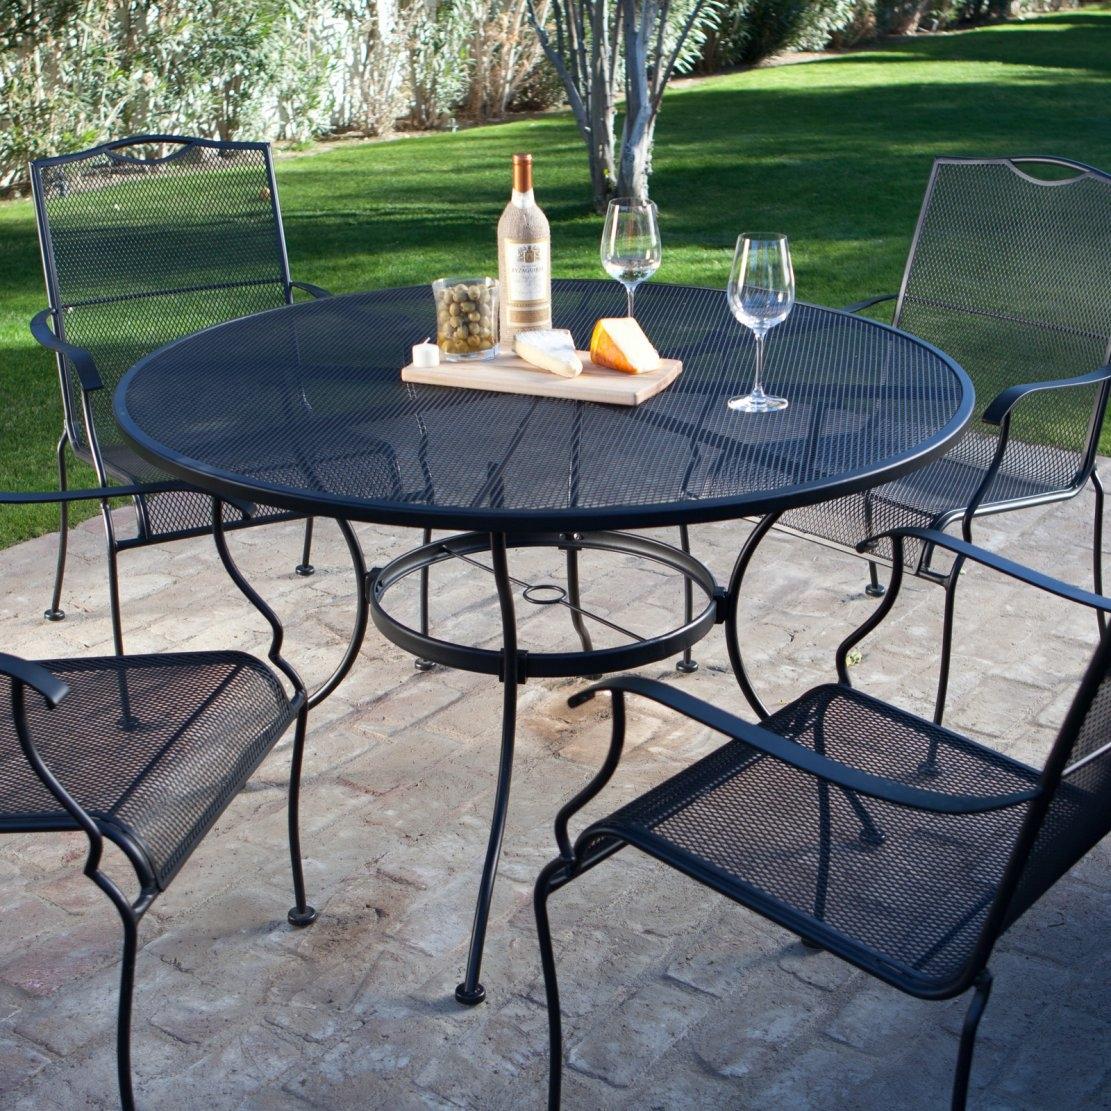 Get a Quality Wrought Iron patio set